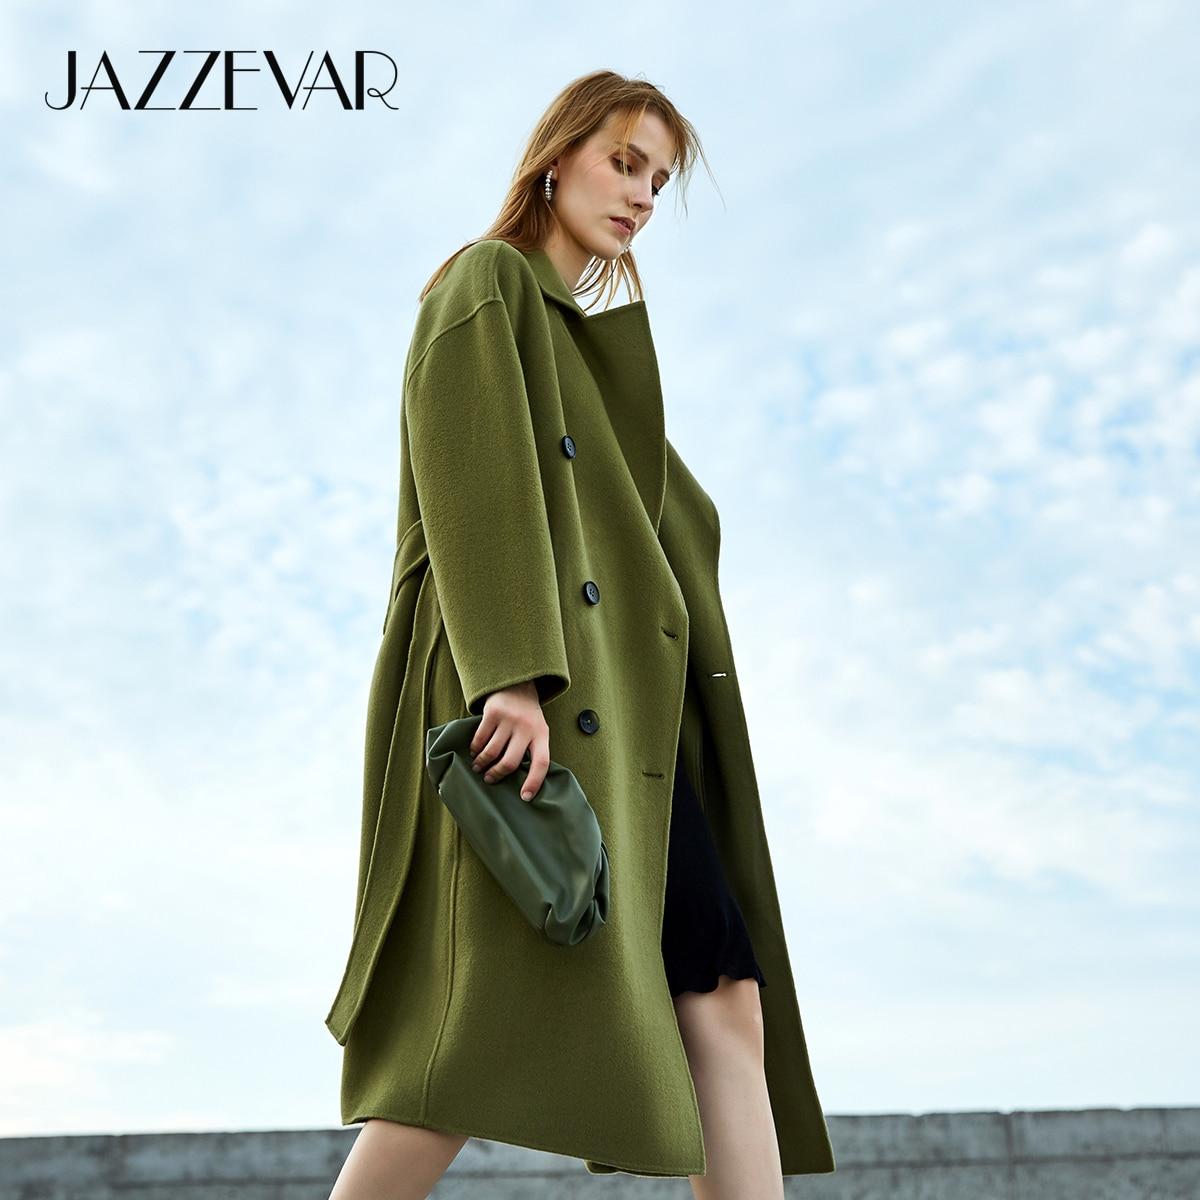 JAZZEVAR 2020 New Winter Women Hand sewn Outerwear High Fashion Street Lady Double Breasted Woollen Double faced X Long Coats|Wool & Blends|   - AliExpress